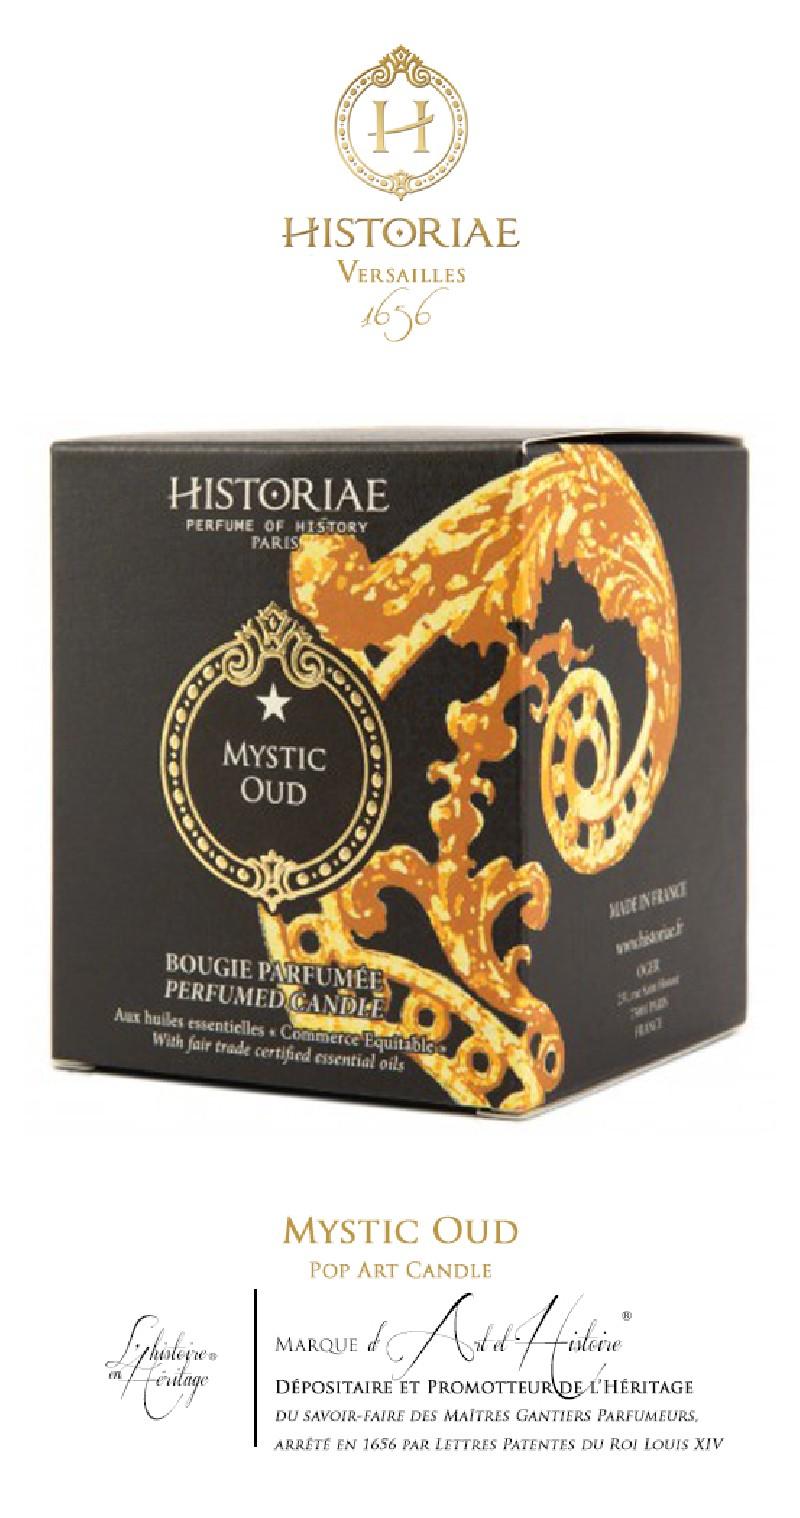 Mystic Oud - Pop Art Candle